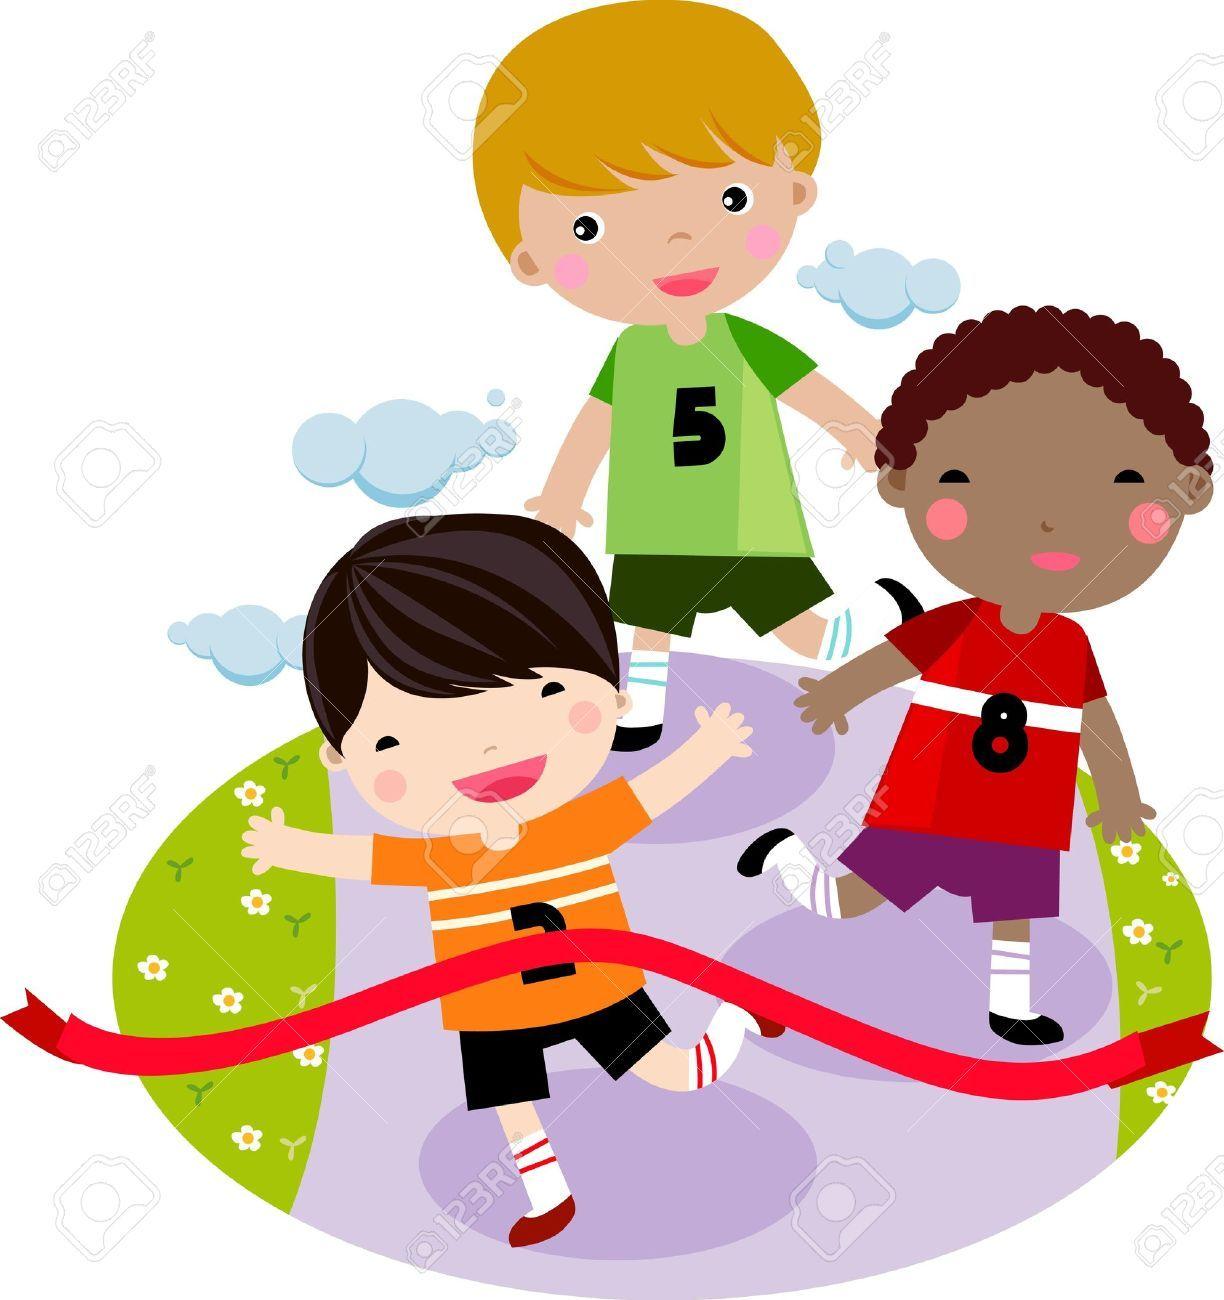 Free kids running clipart 7 » Clipart Portal.